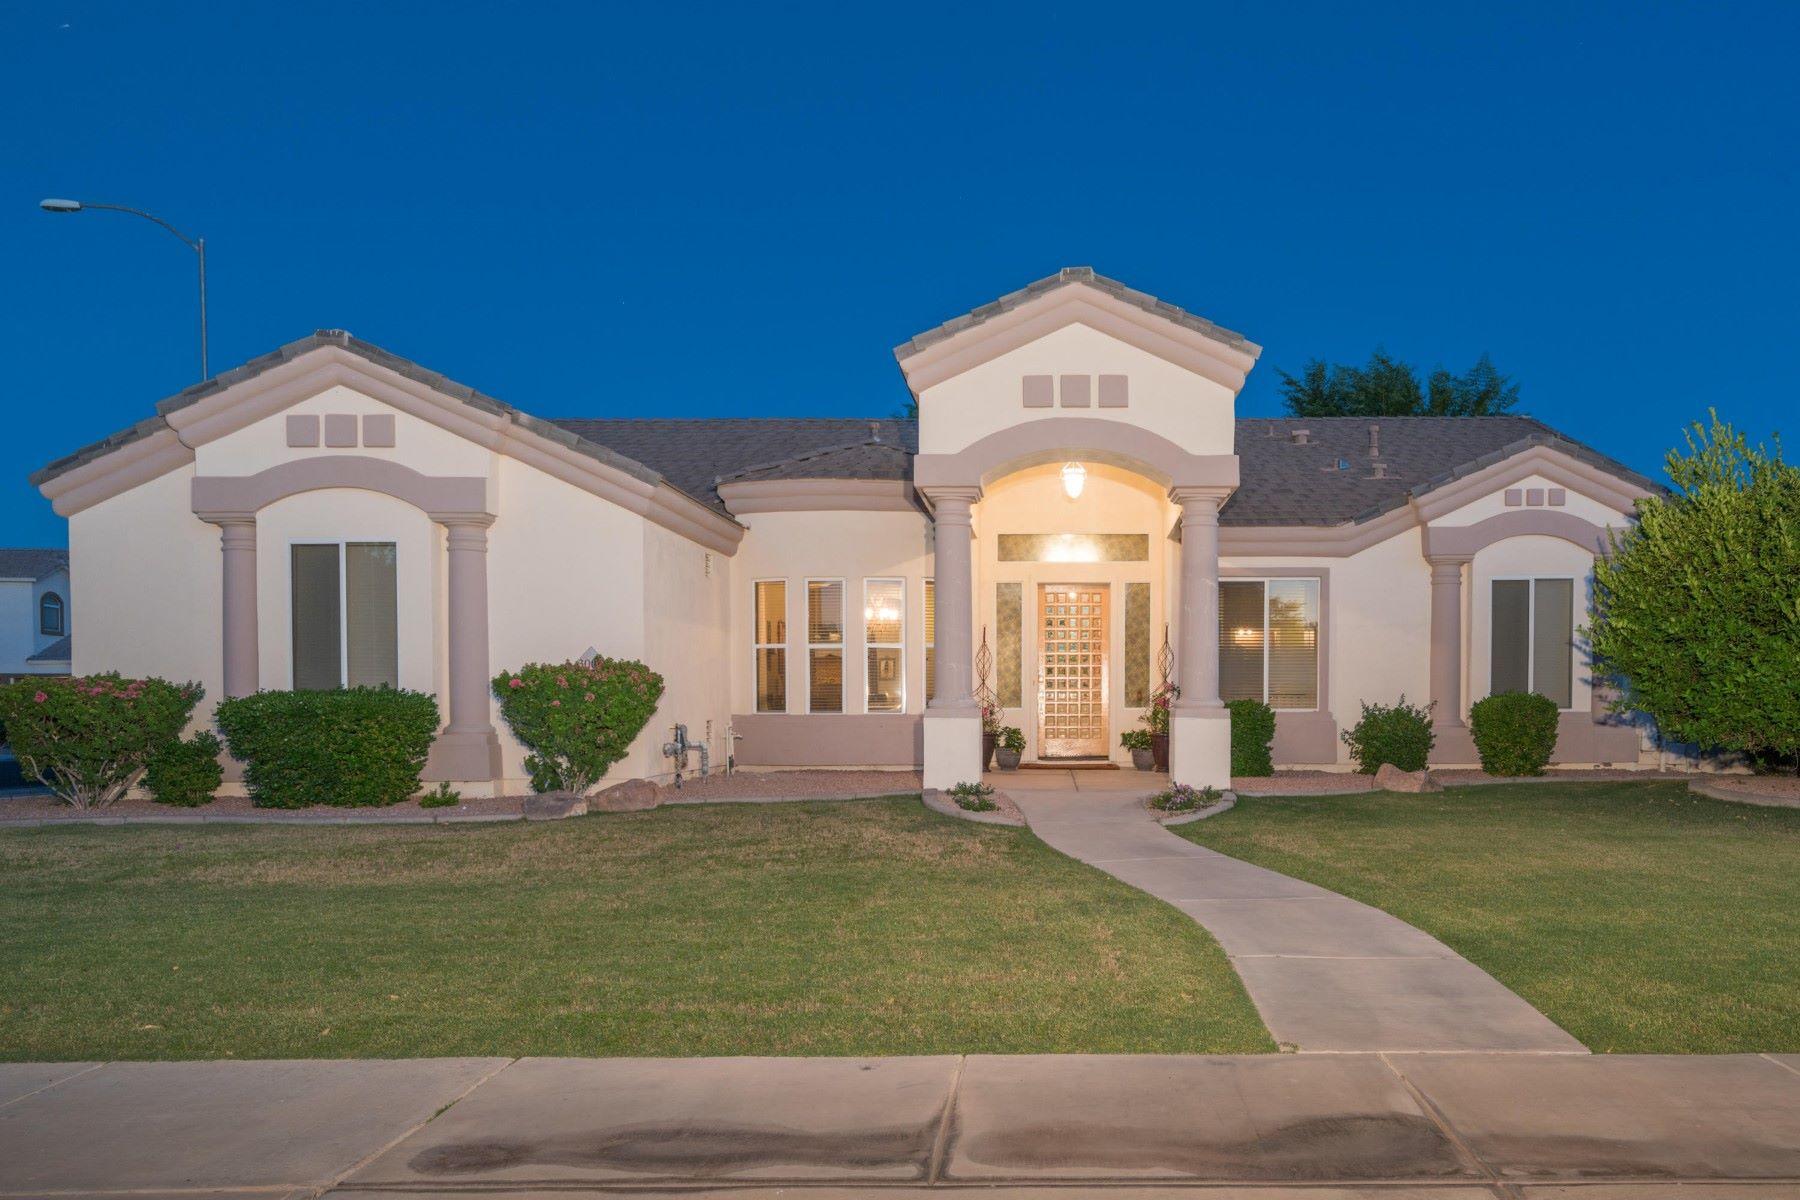 واحد منزل الأسرة للـ Sale في Beautiful custom basement home in Kensington Grove 3009 E Huber St Mesa, Arizona, 85213 United States